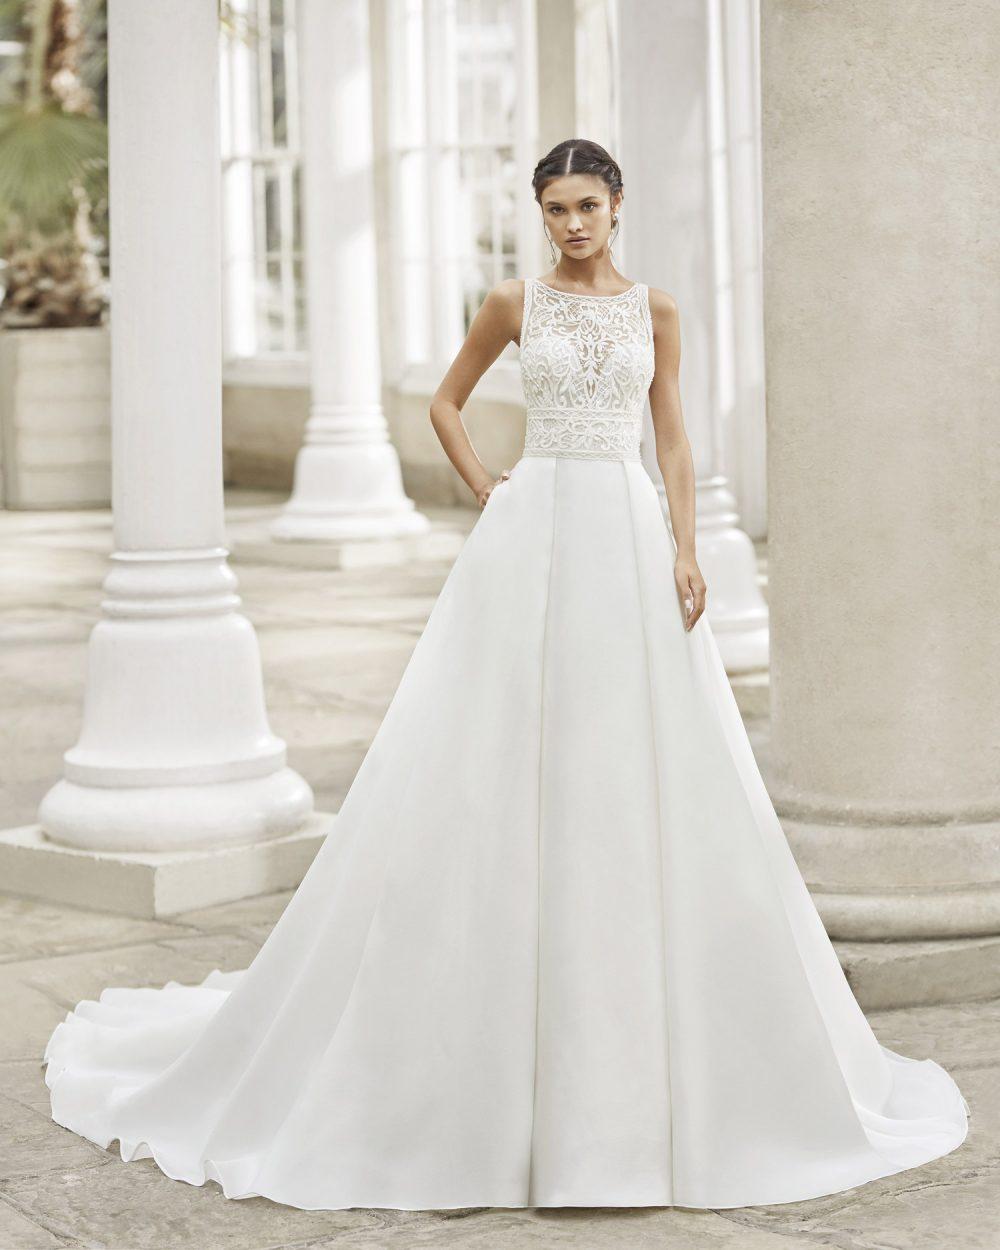 Mariages: abito da sposa Rosa Clarà 2021 a Vicenza, Verona, Padova, Veneto 5A179 TREBOL